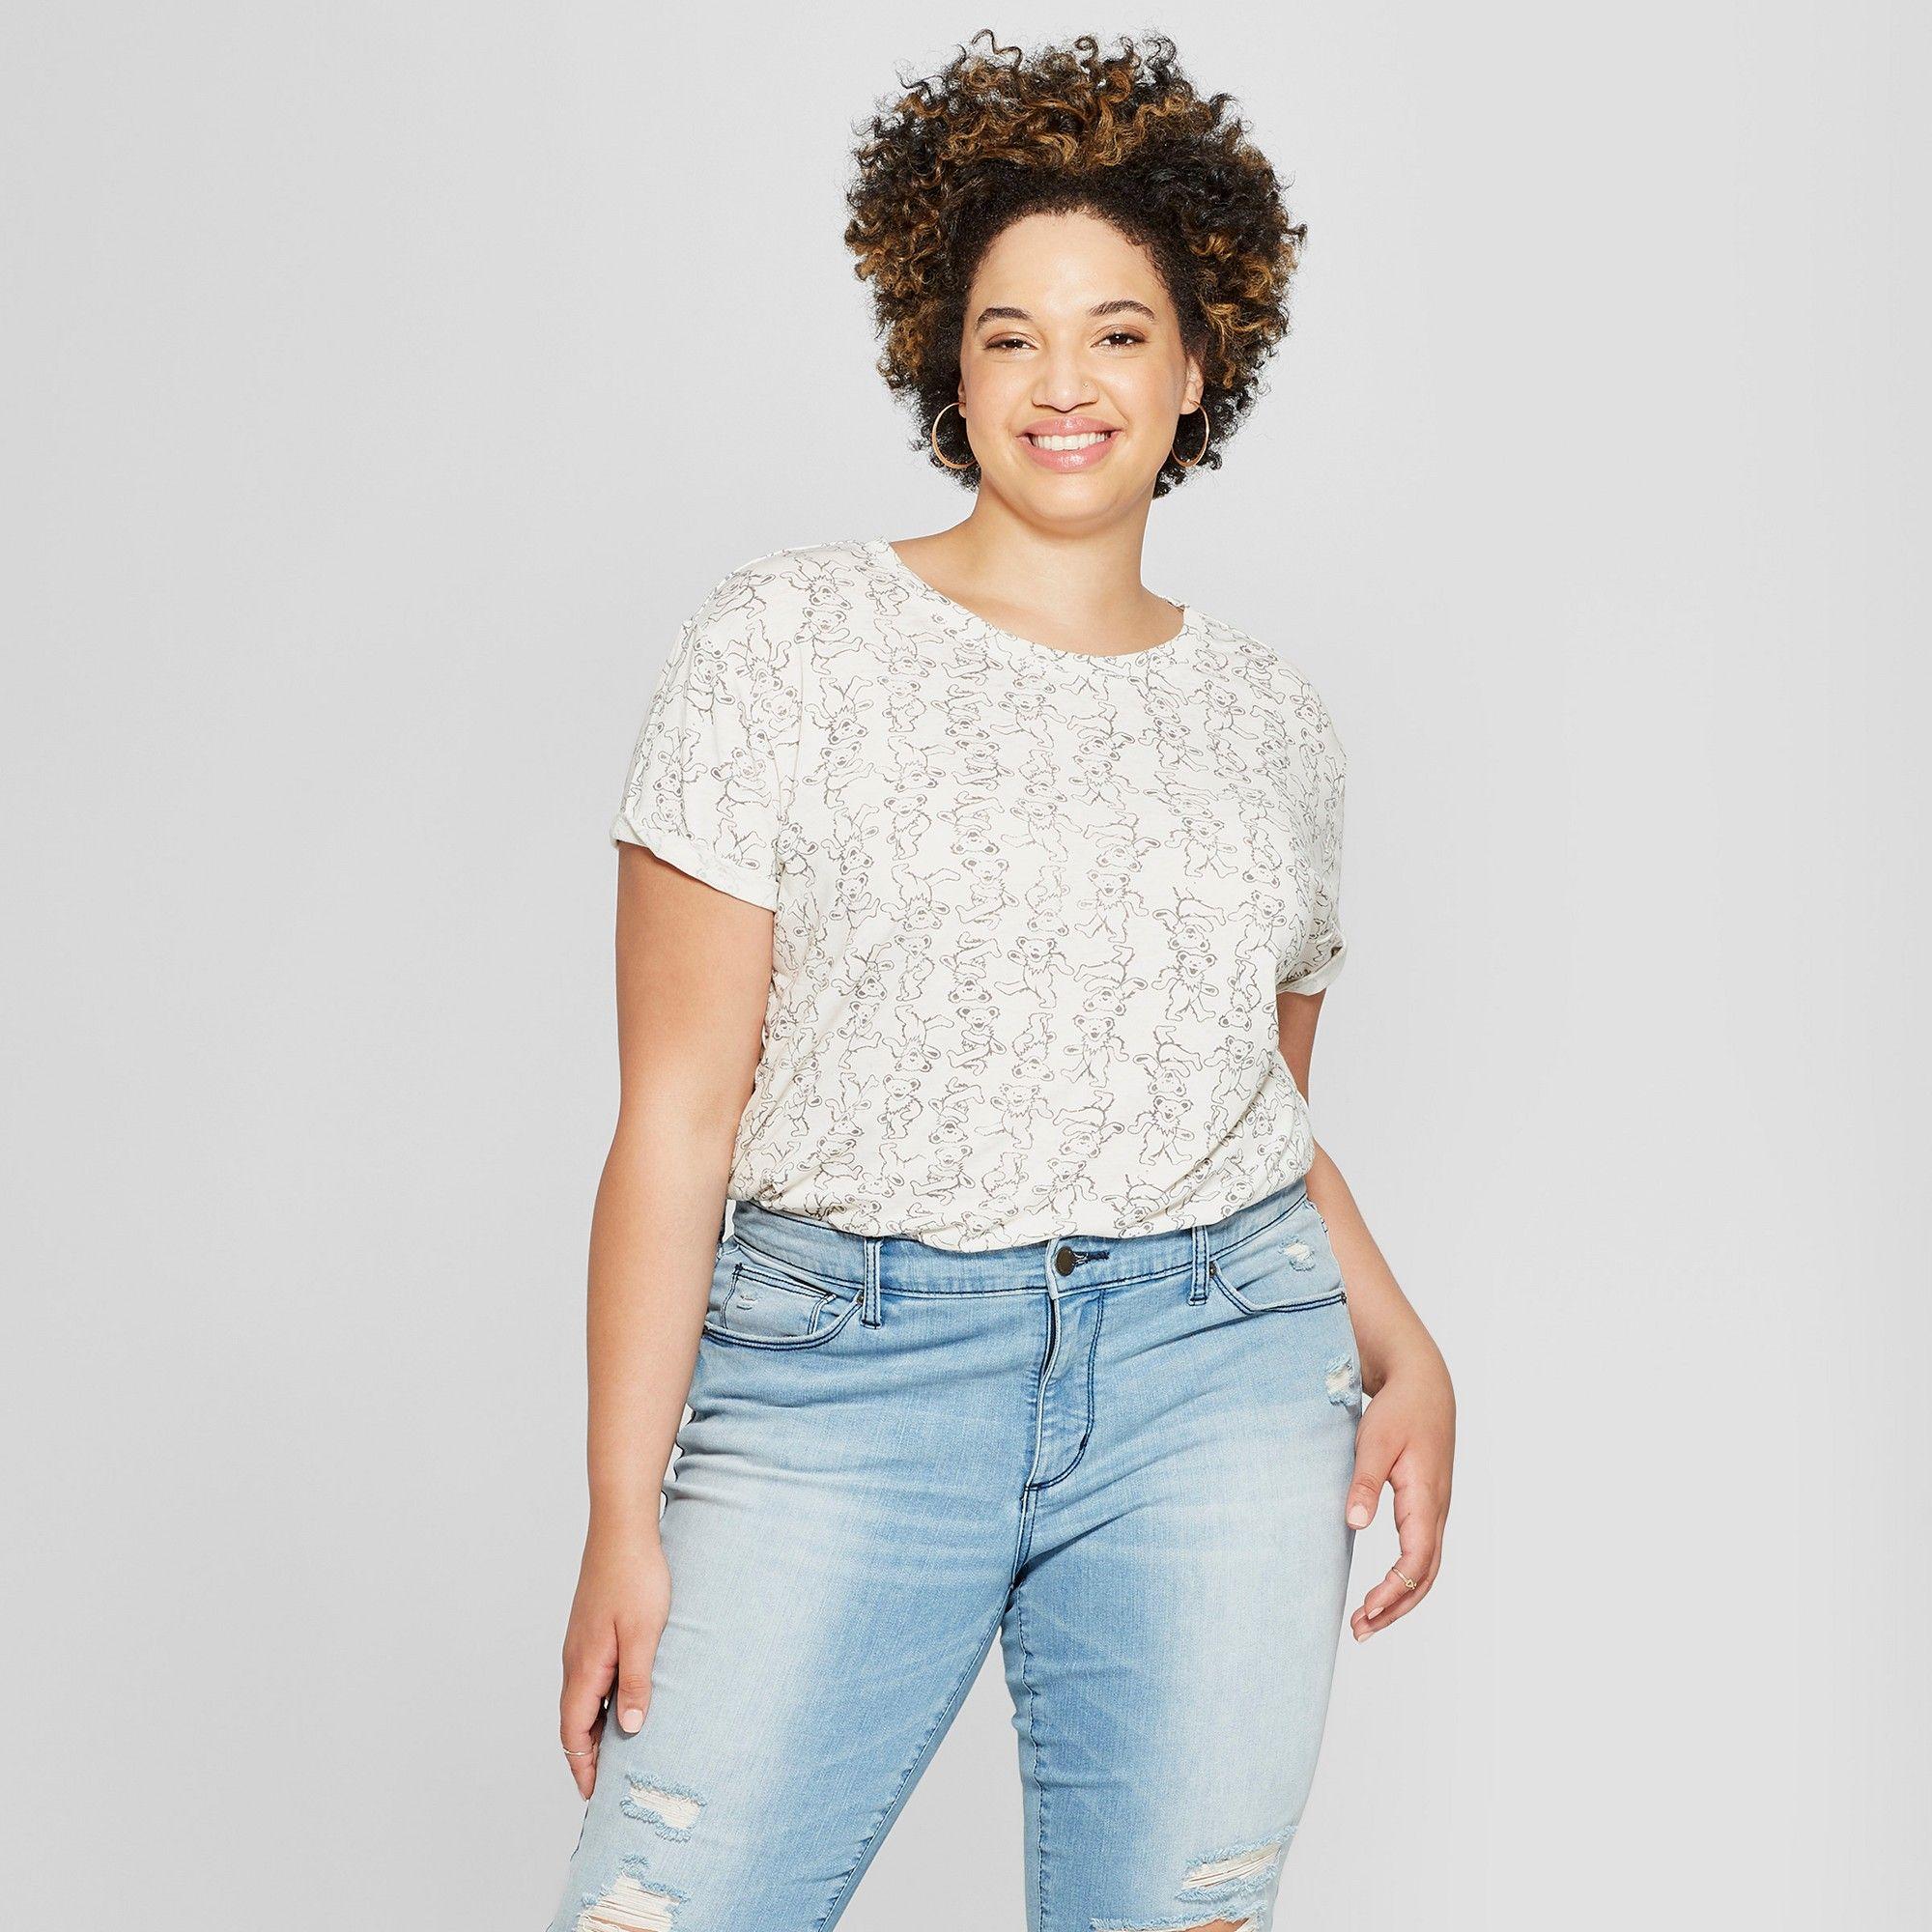 b95afdfc712 Women s Grateful Dead Plus Size Short Sleeve Bear Print Graphic T-Shirt  (Juniors ) White 2X